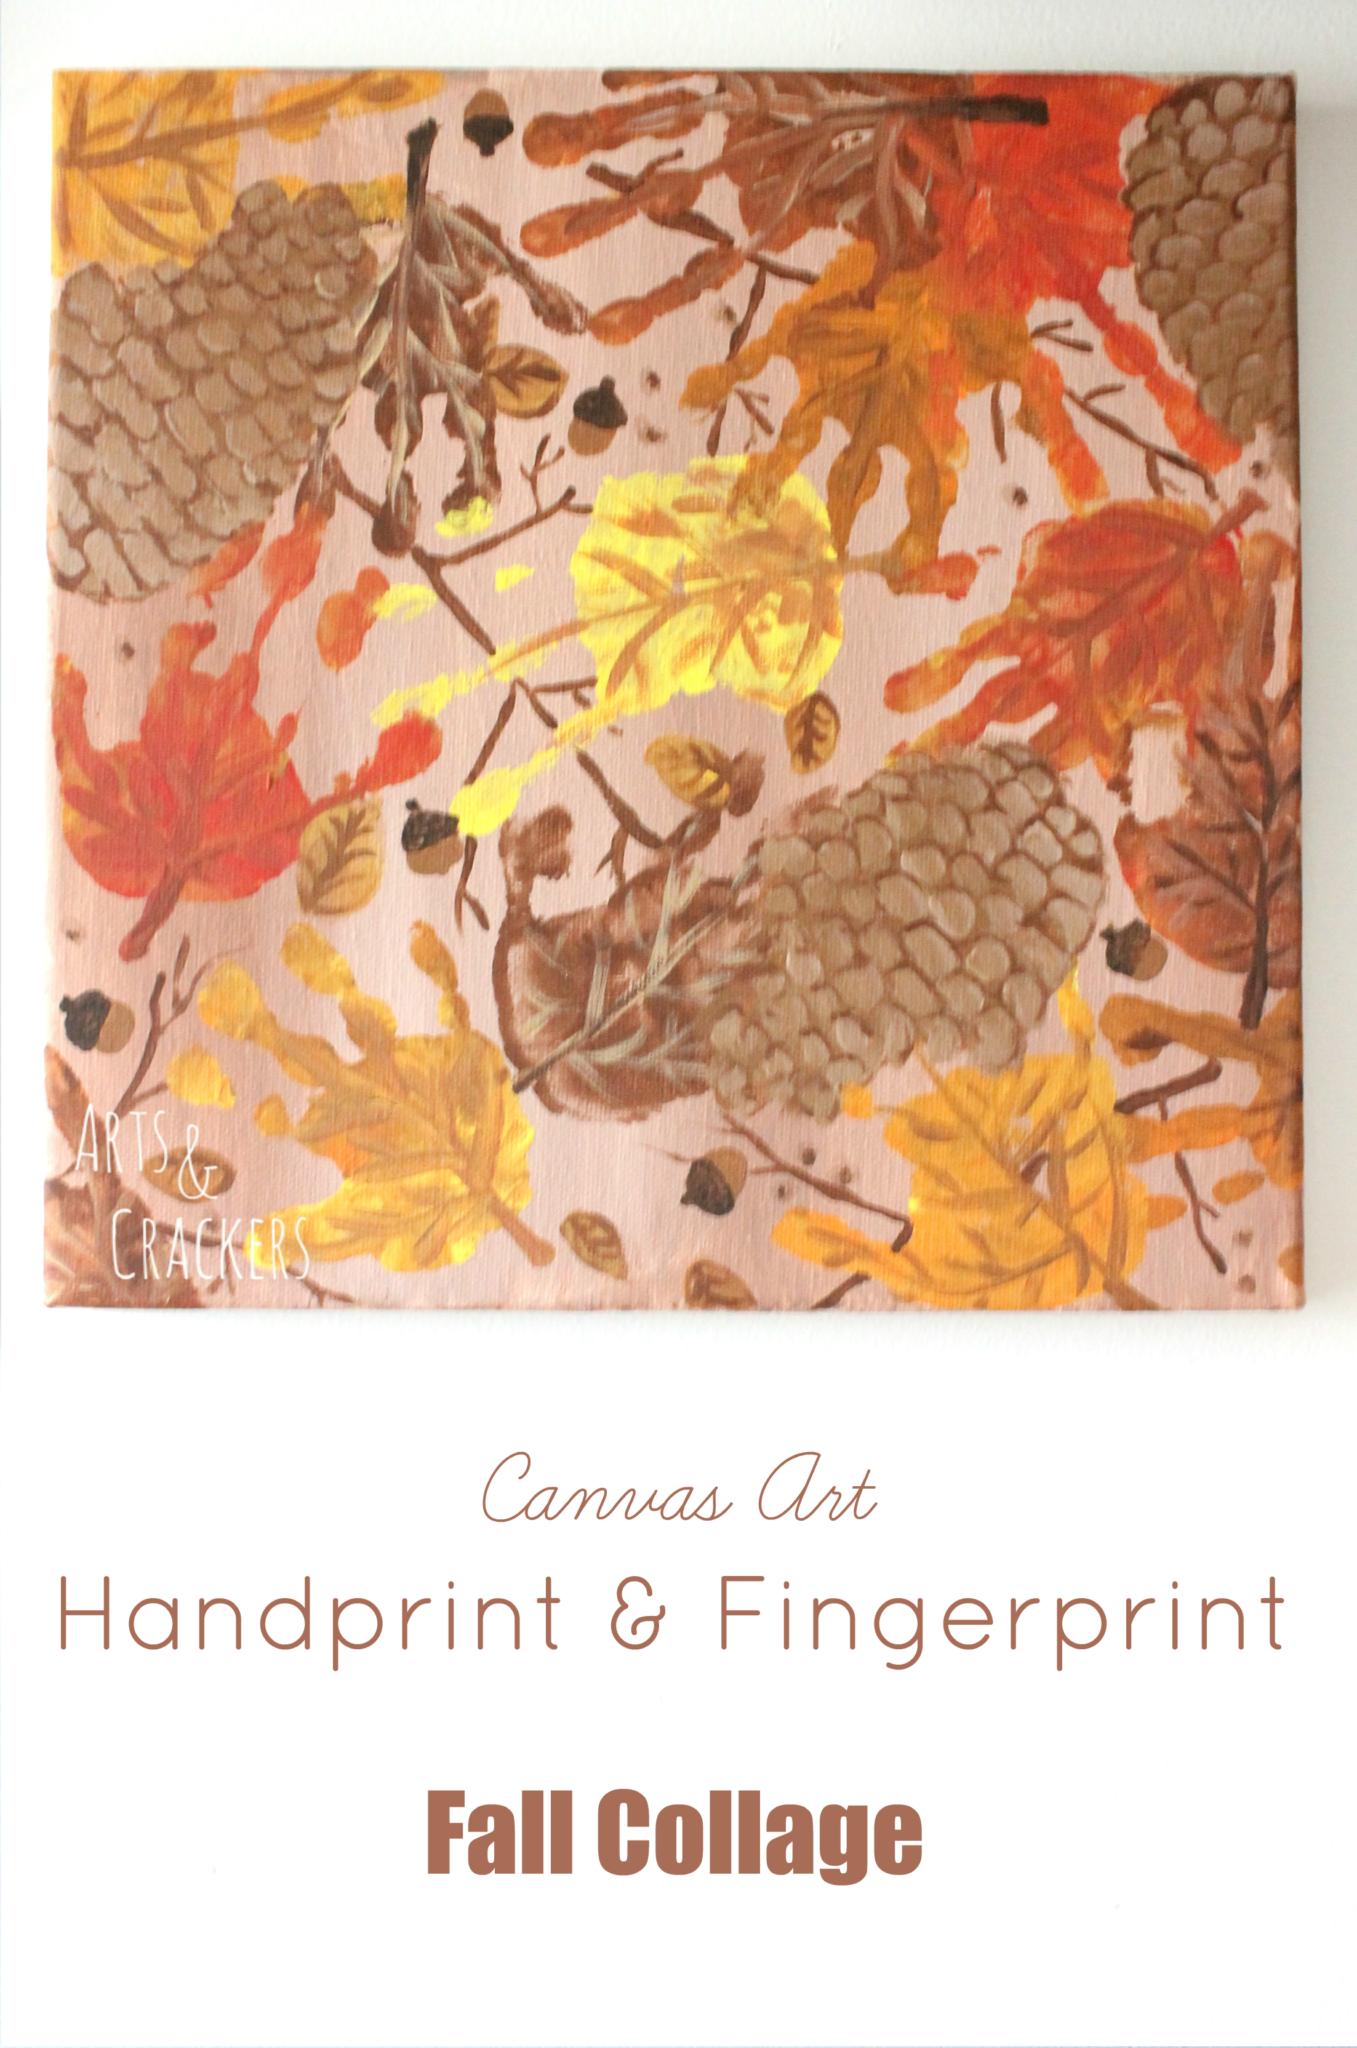 Handprint and Fingerprint Fall Collage